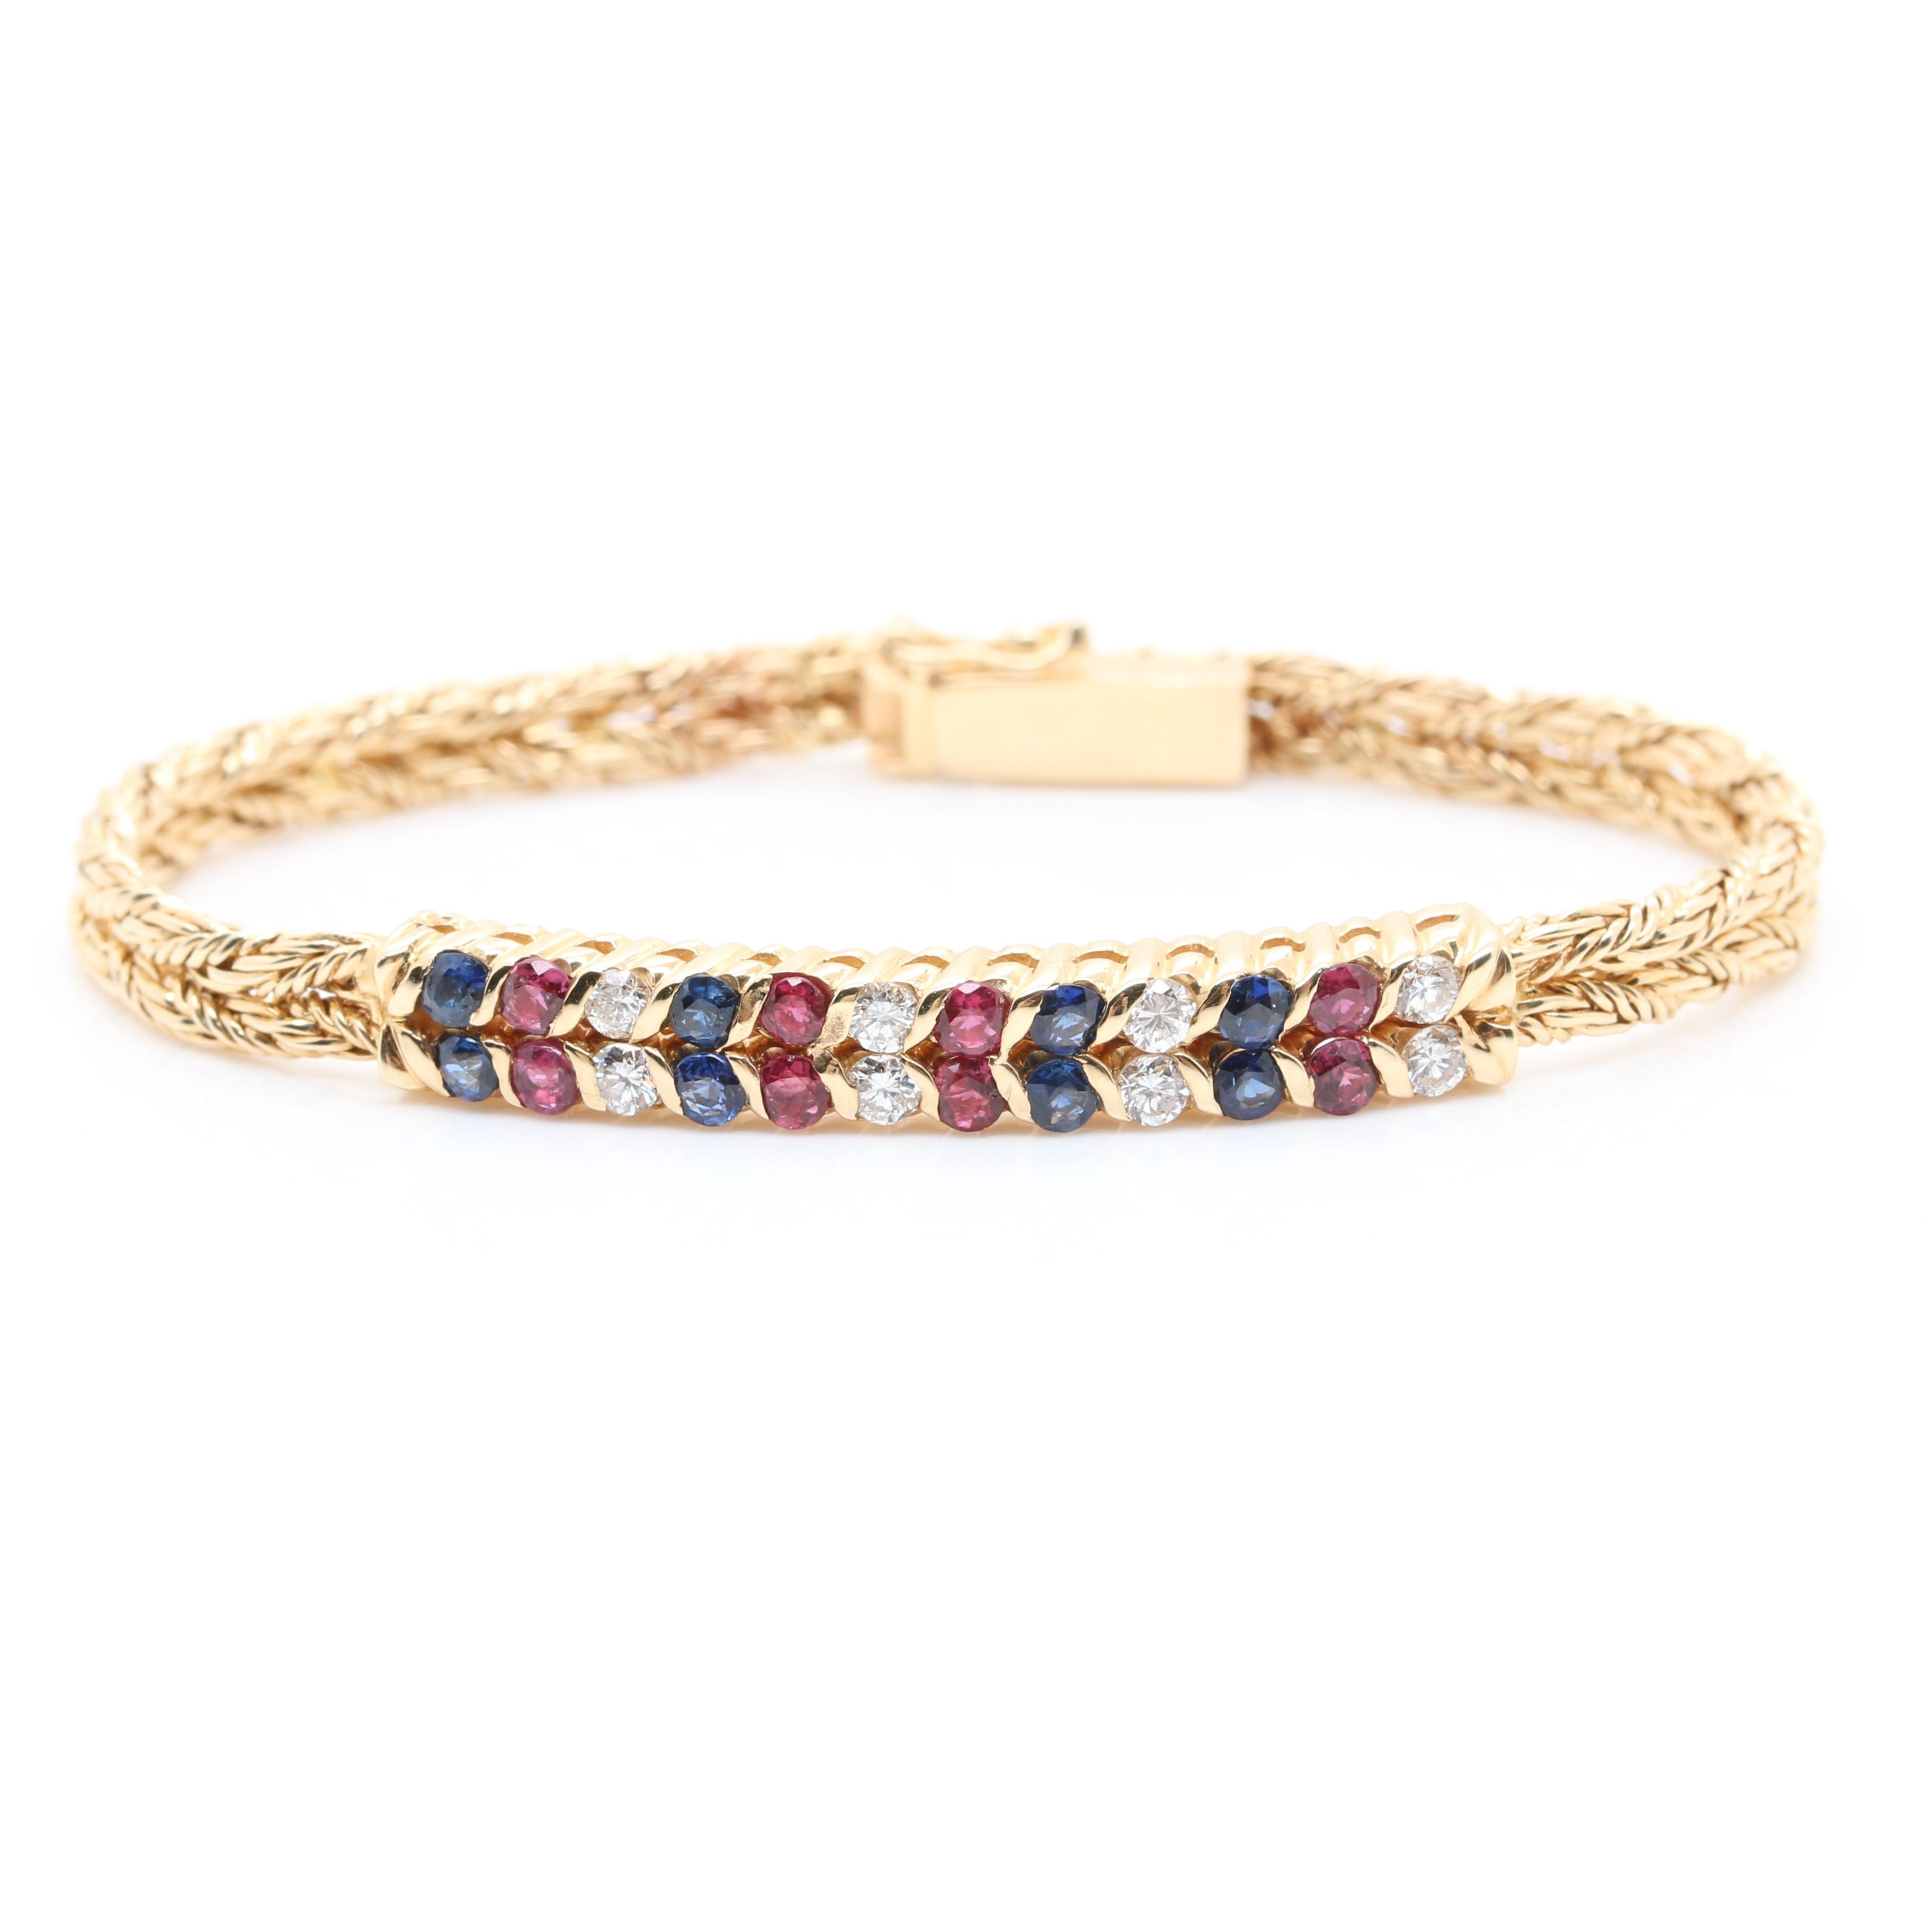 14K Yellow Gold Diamond, Ruby, and Sapphire Bracelet